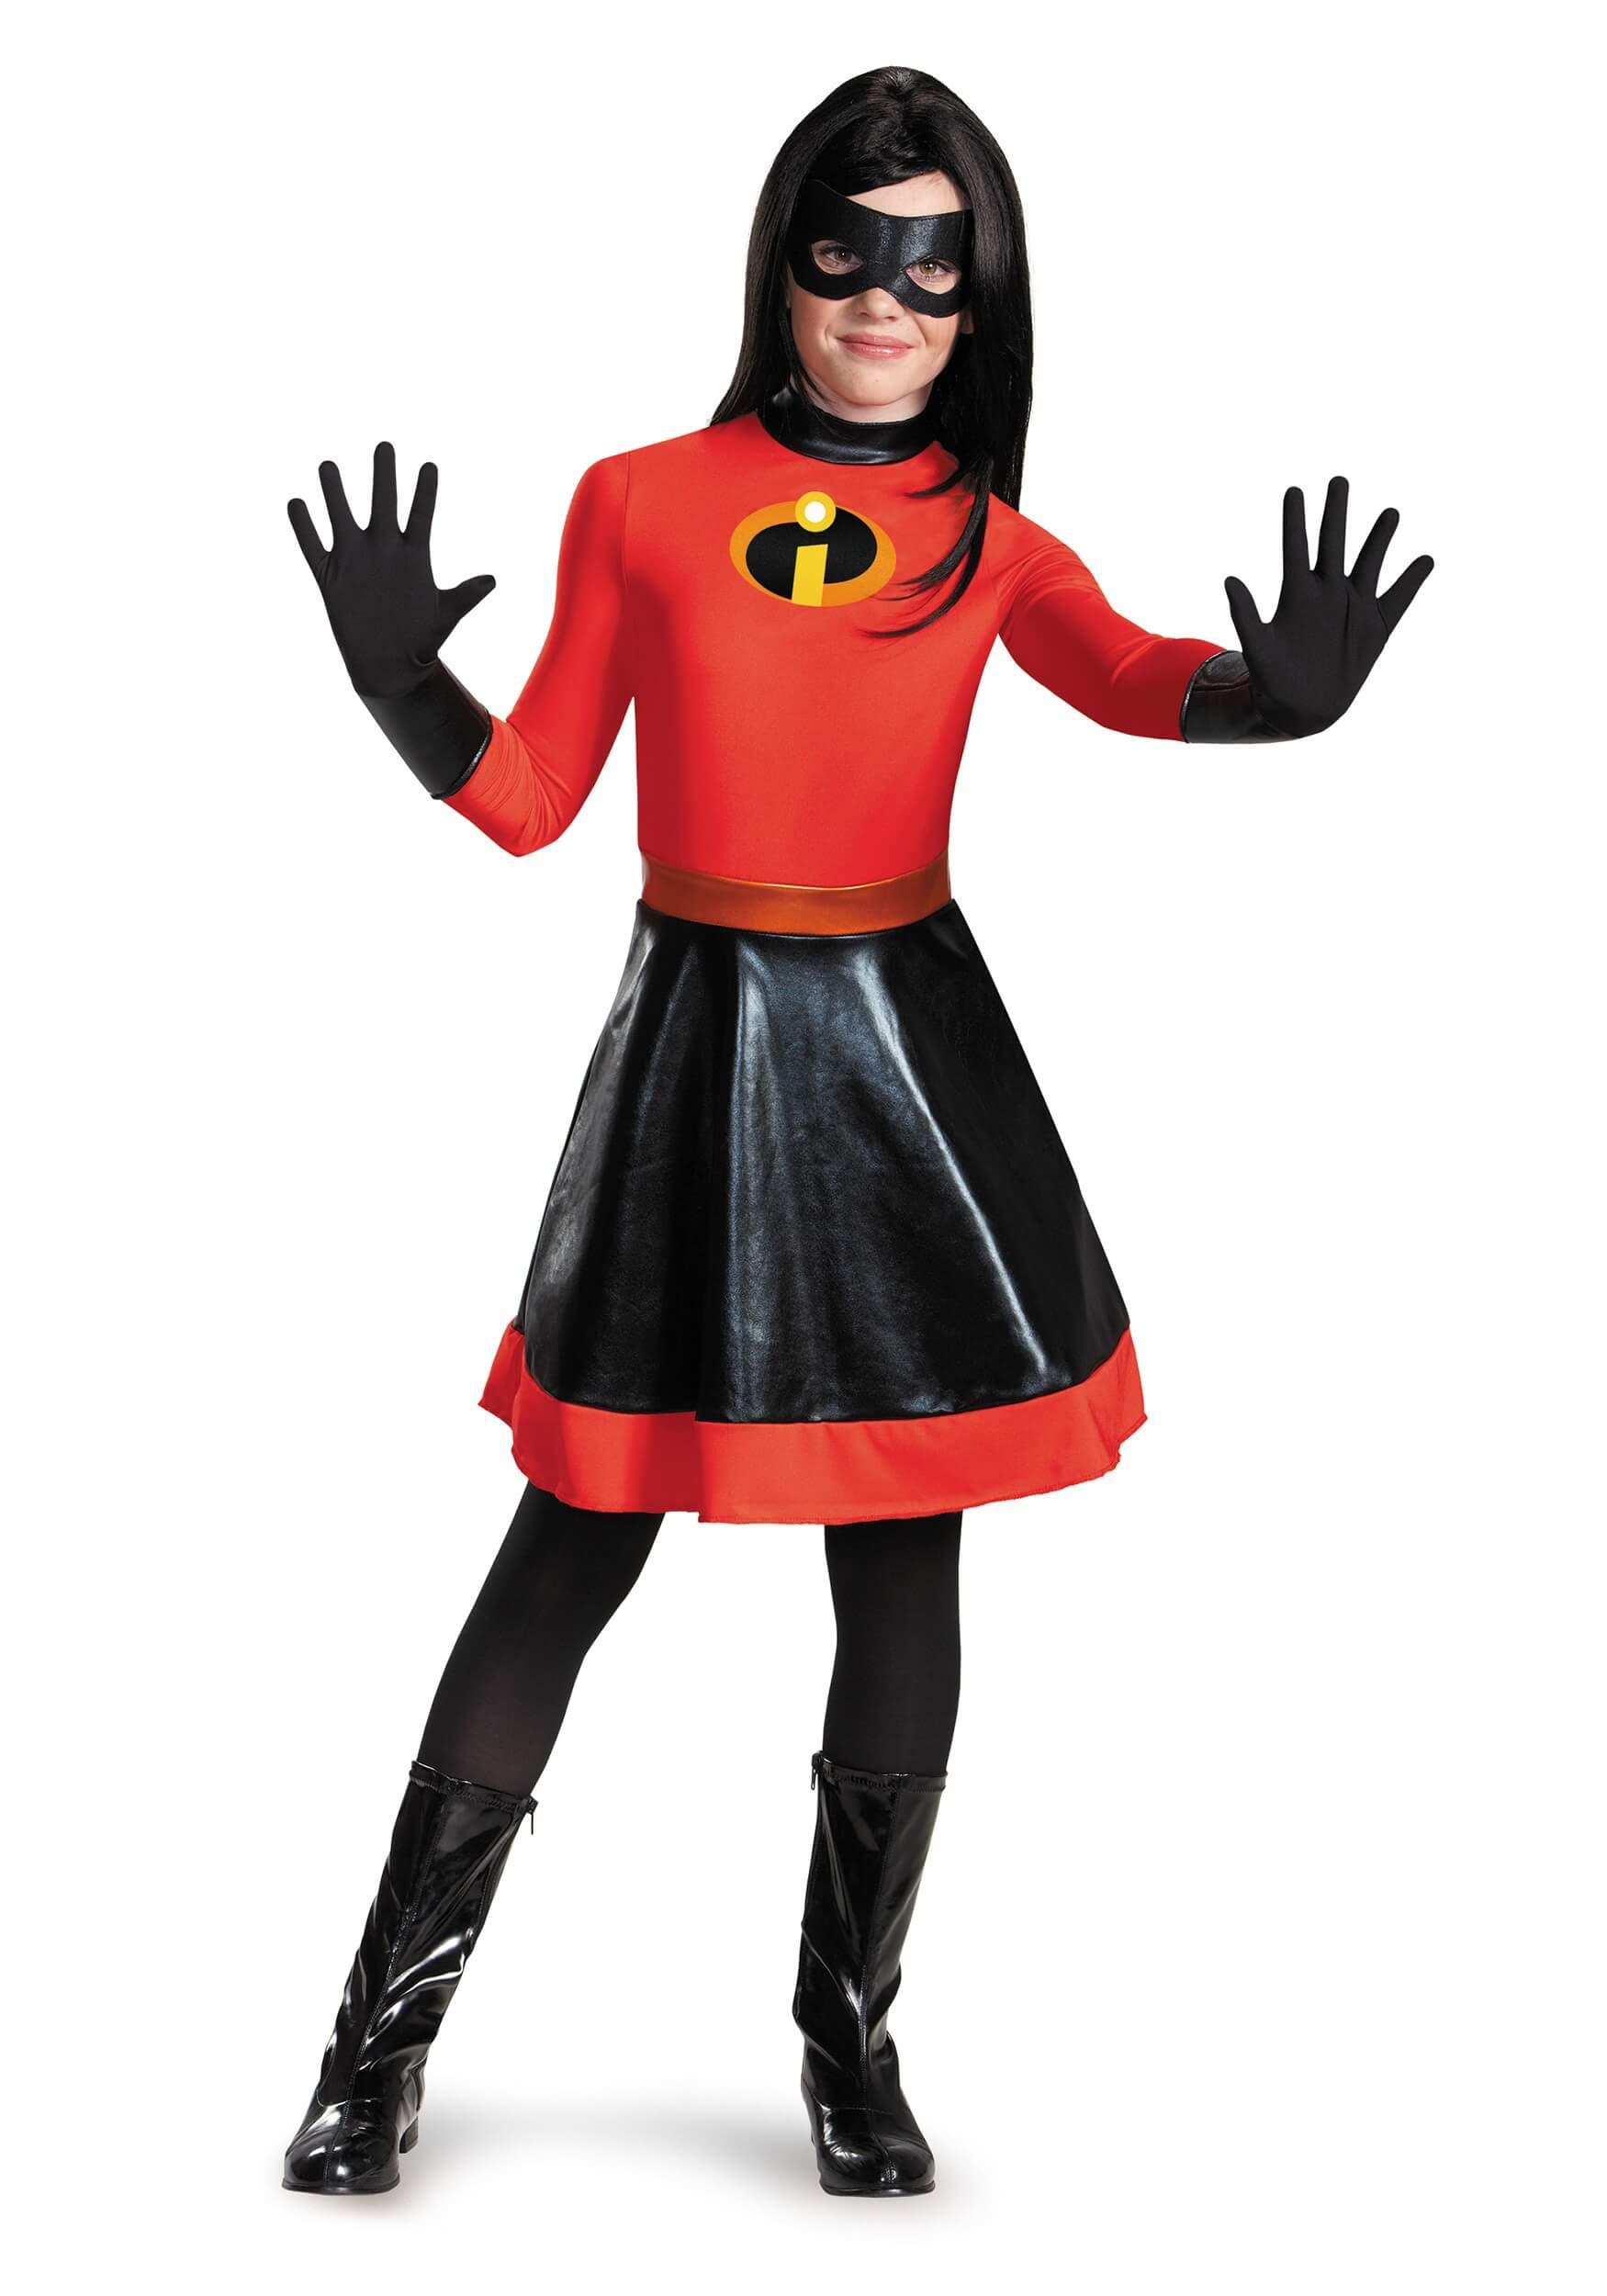 Terrific Halloween Costume Ideas For Teens